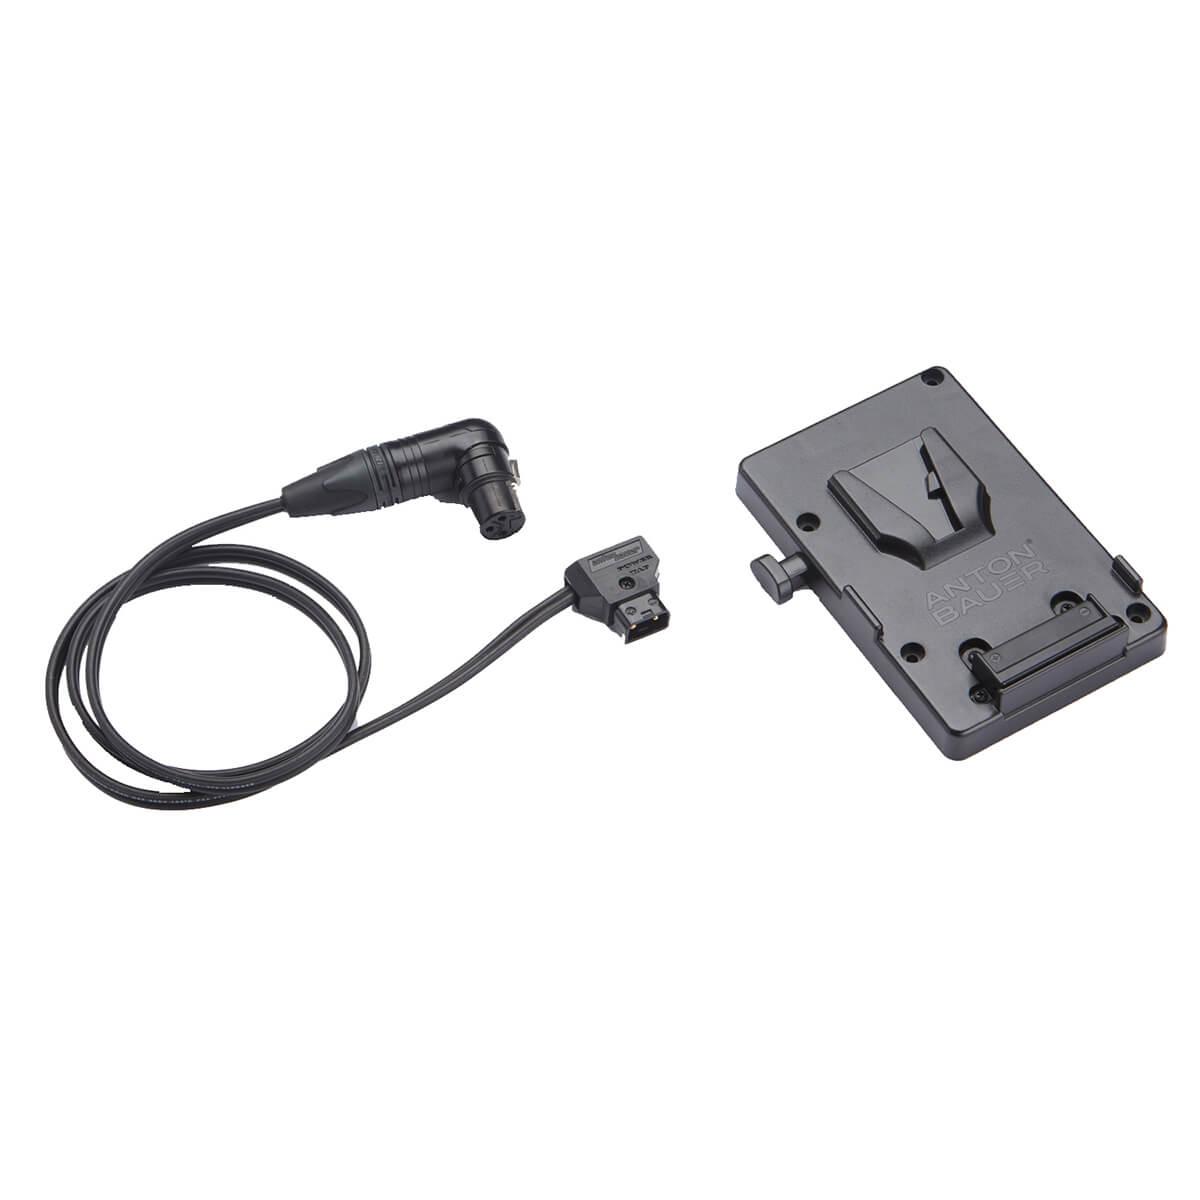 V-Mount Battery Bracket for Astra 1x1 LED Panel - Usado